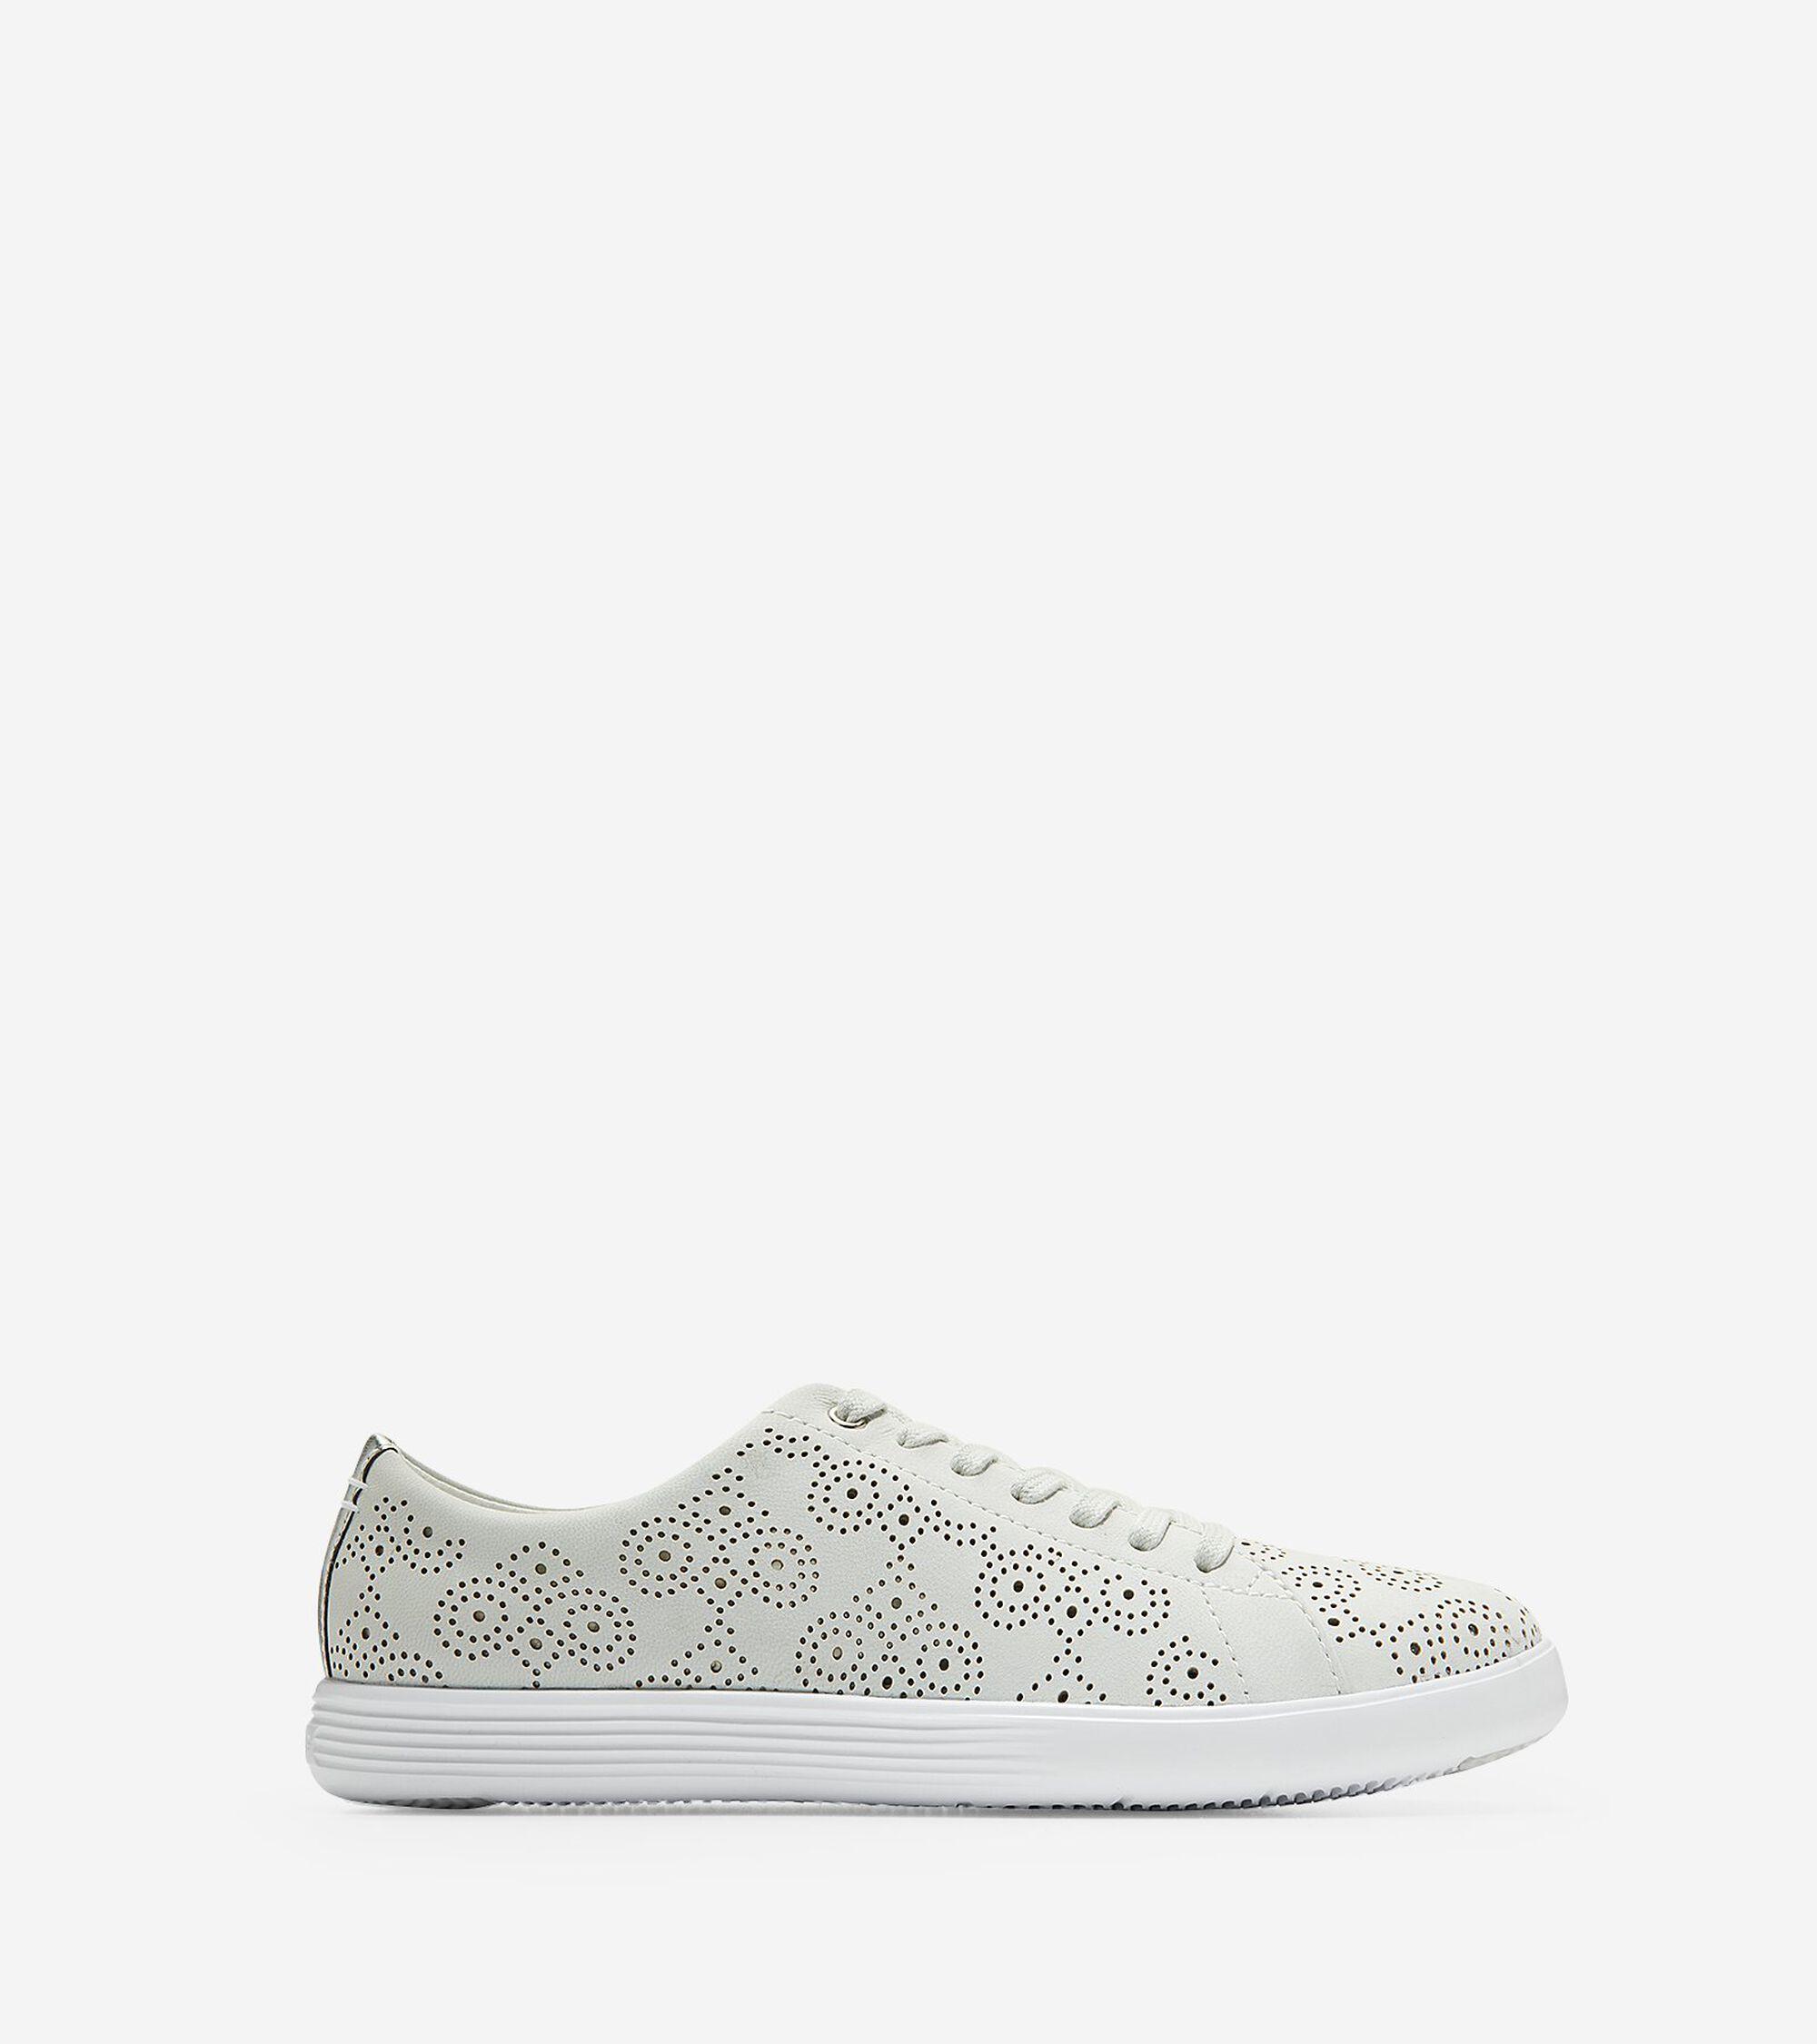 Cole Haan Women's Grand Crosscourt Perforated Sneaker